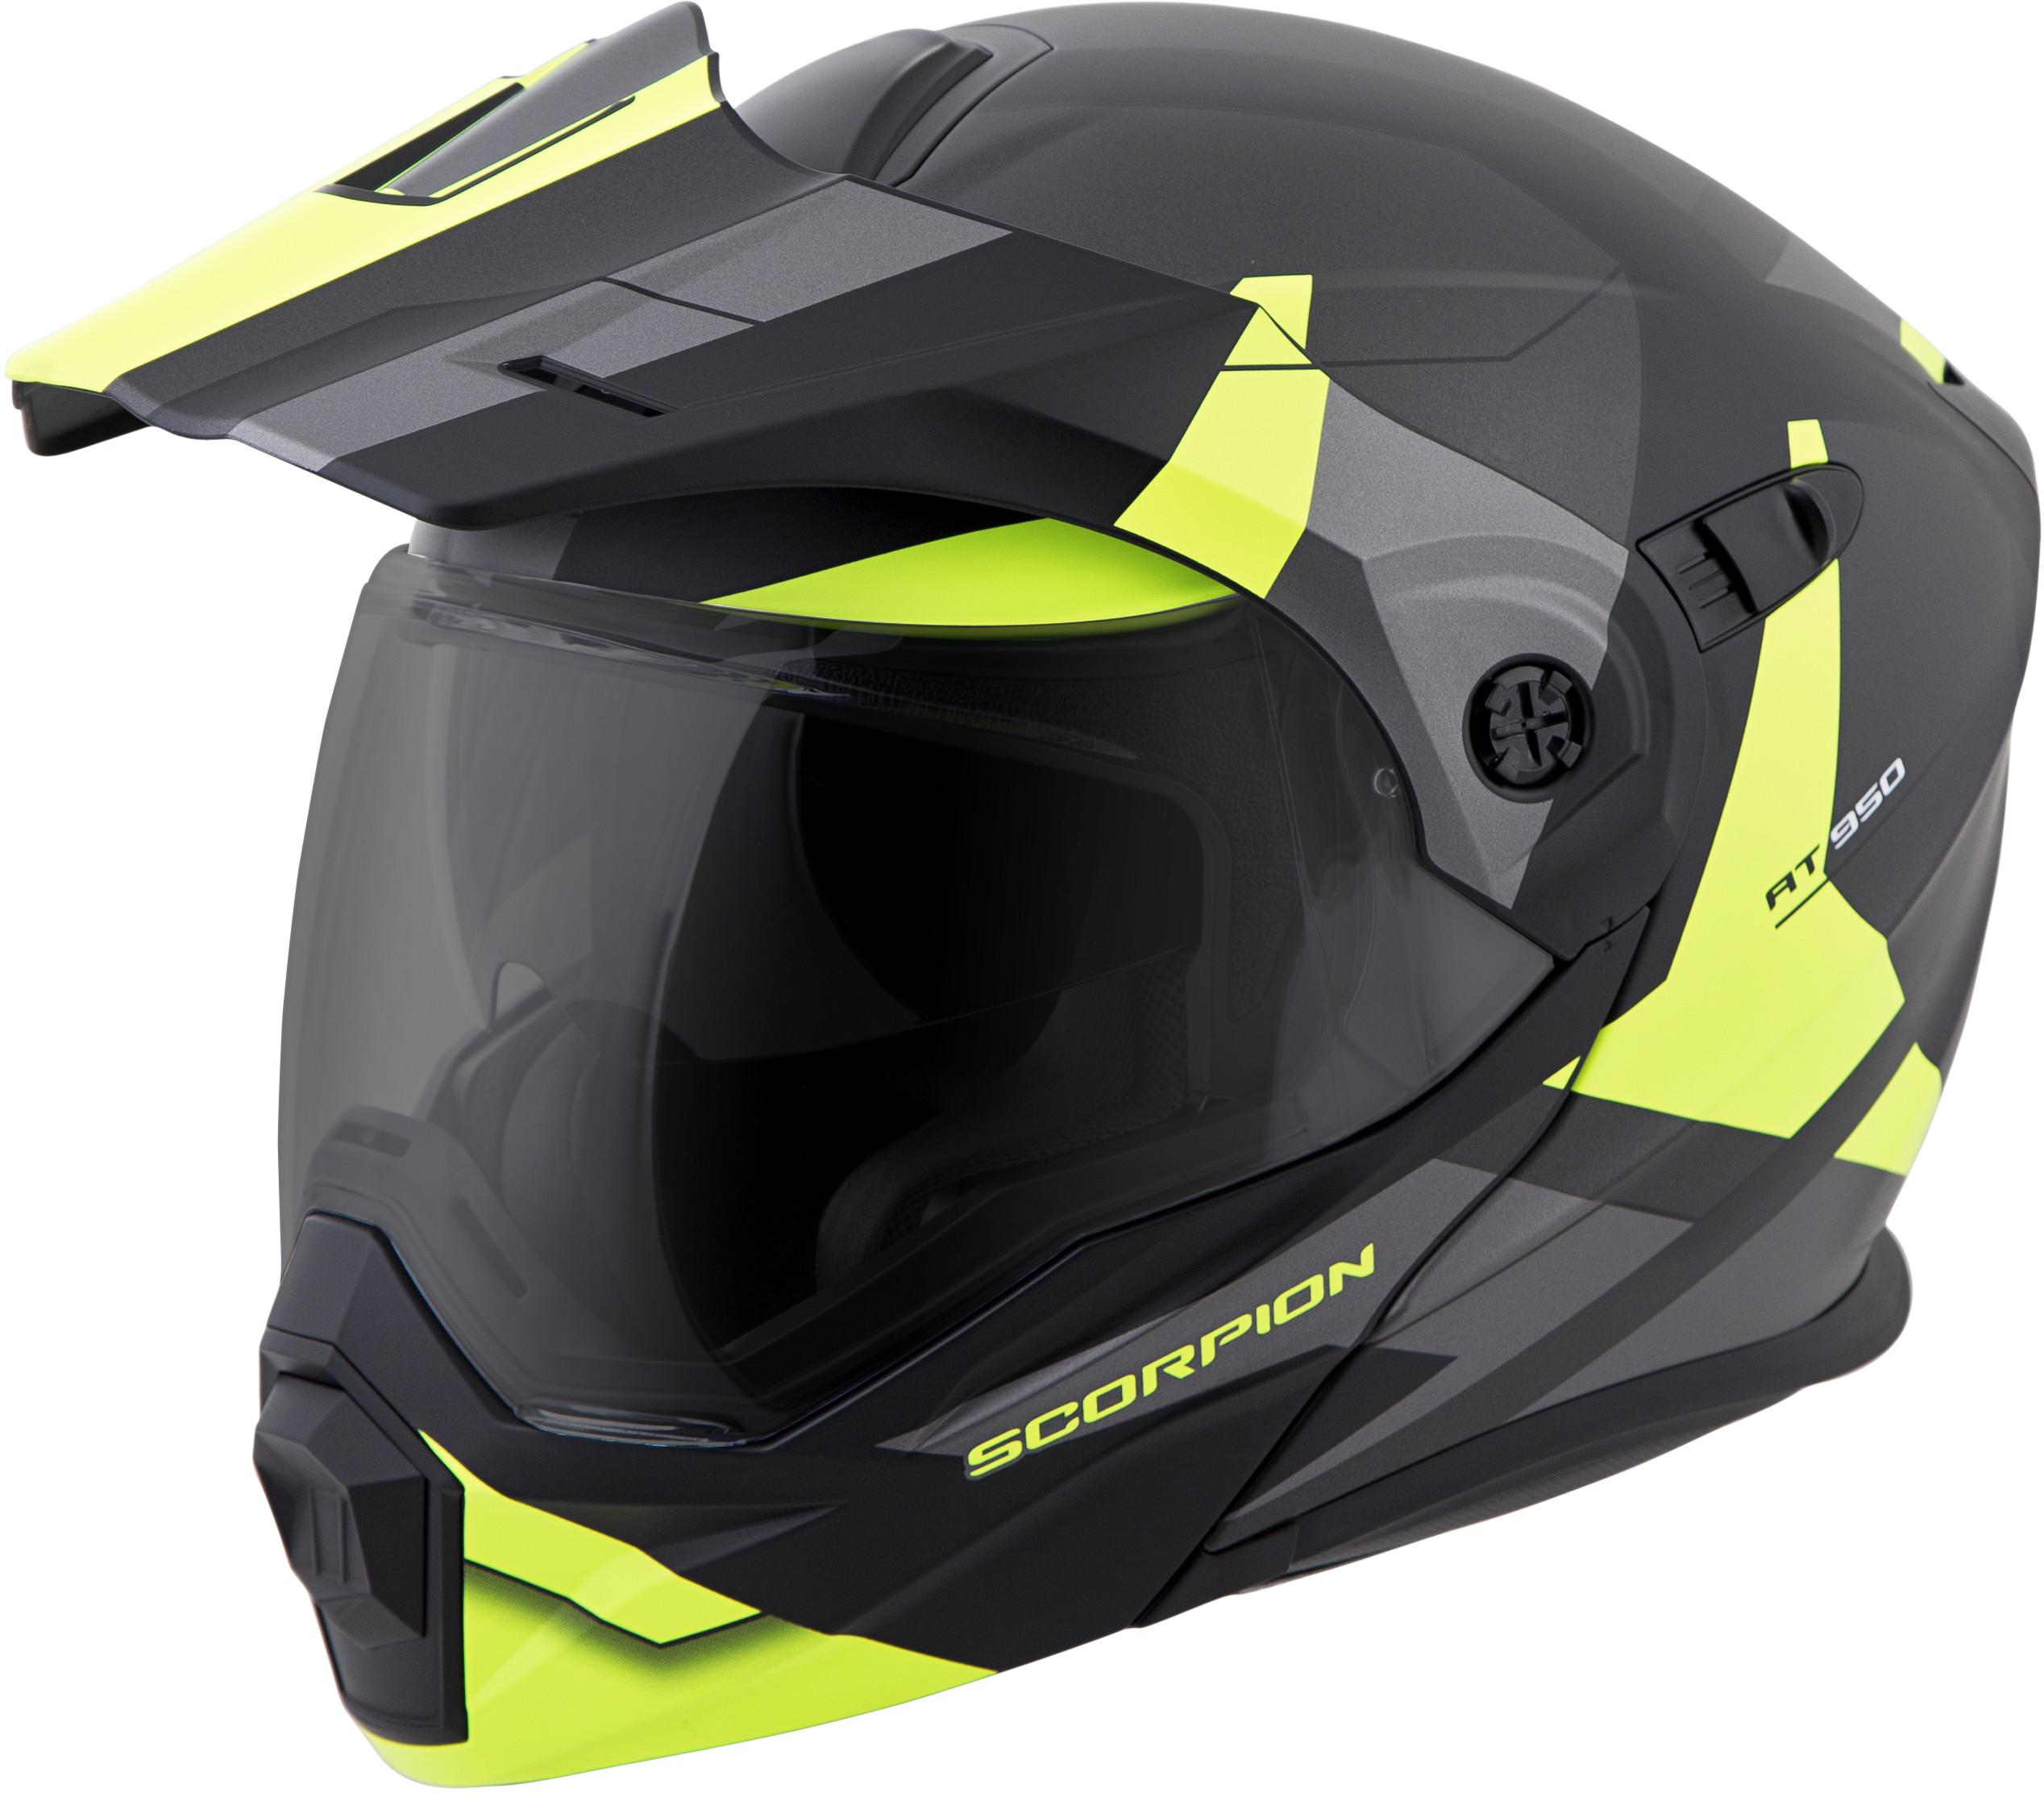 for-Scorpion-Helmet-EXO-AT950-Neocon-Snow-Helmet-with-Dual-Lens-Shield miniature 37